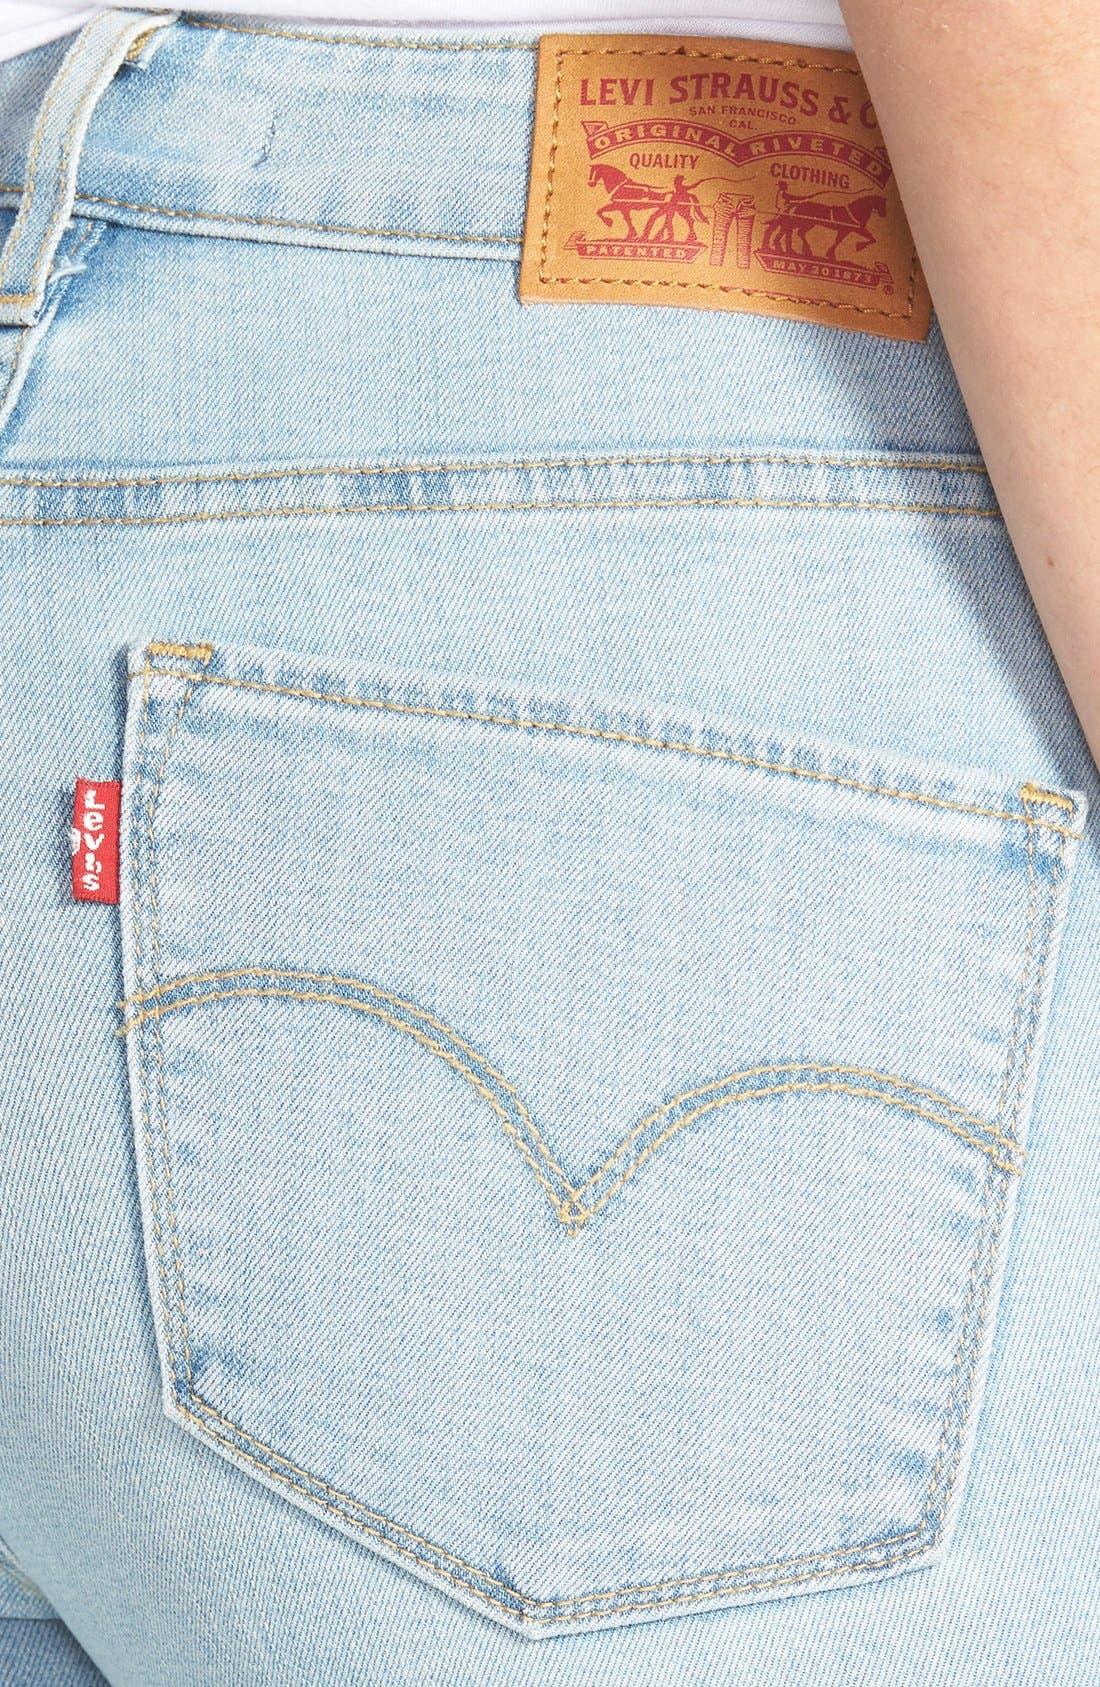 Alternate Image 3  - Levi's® '721' High Rise Skinny Jeans (Light)